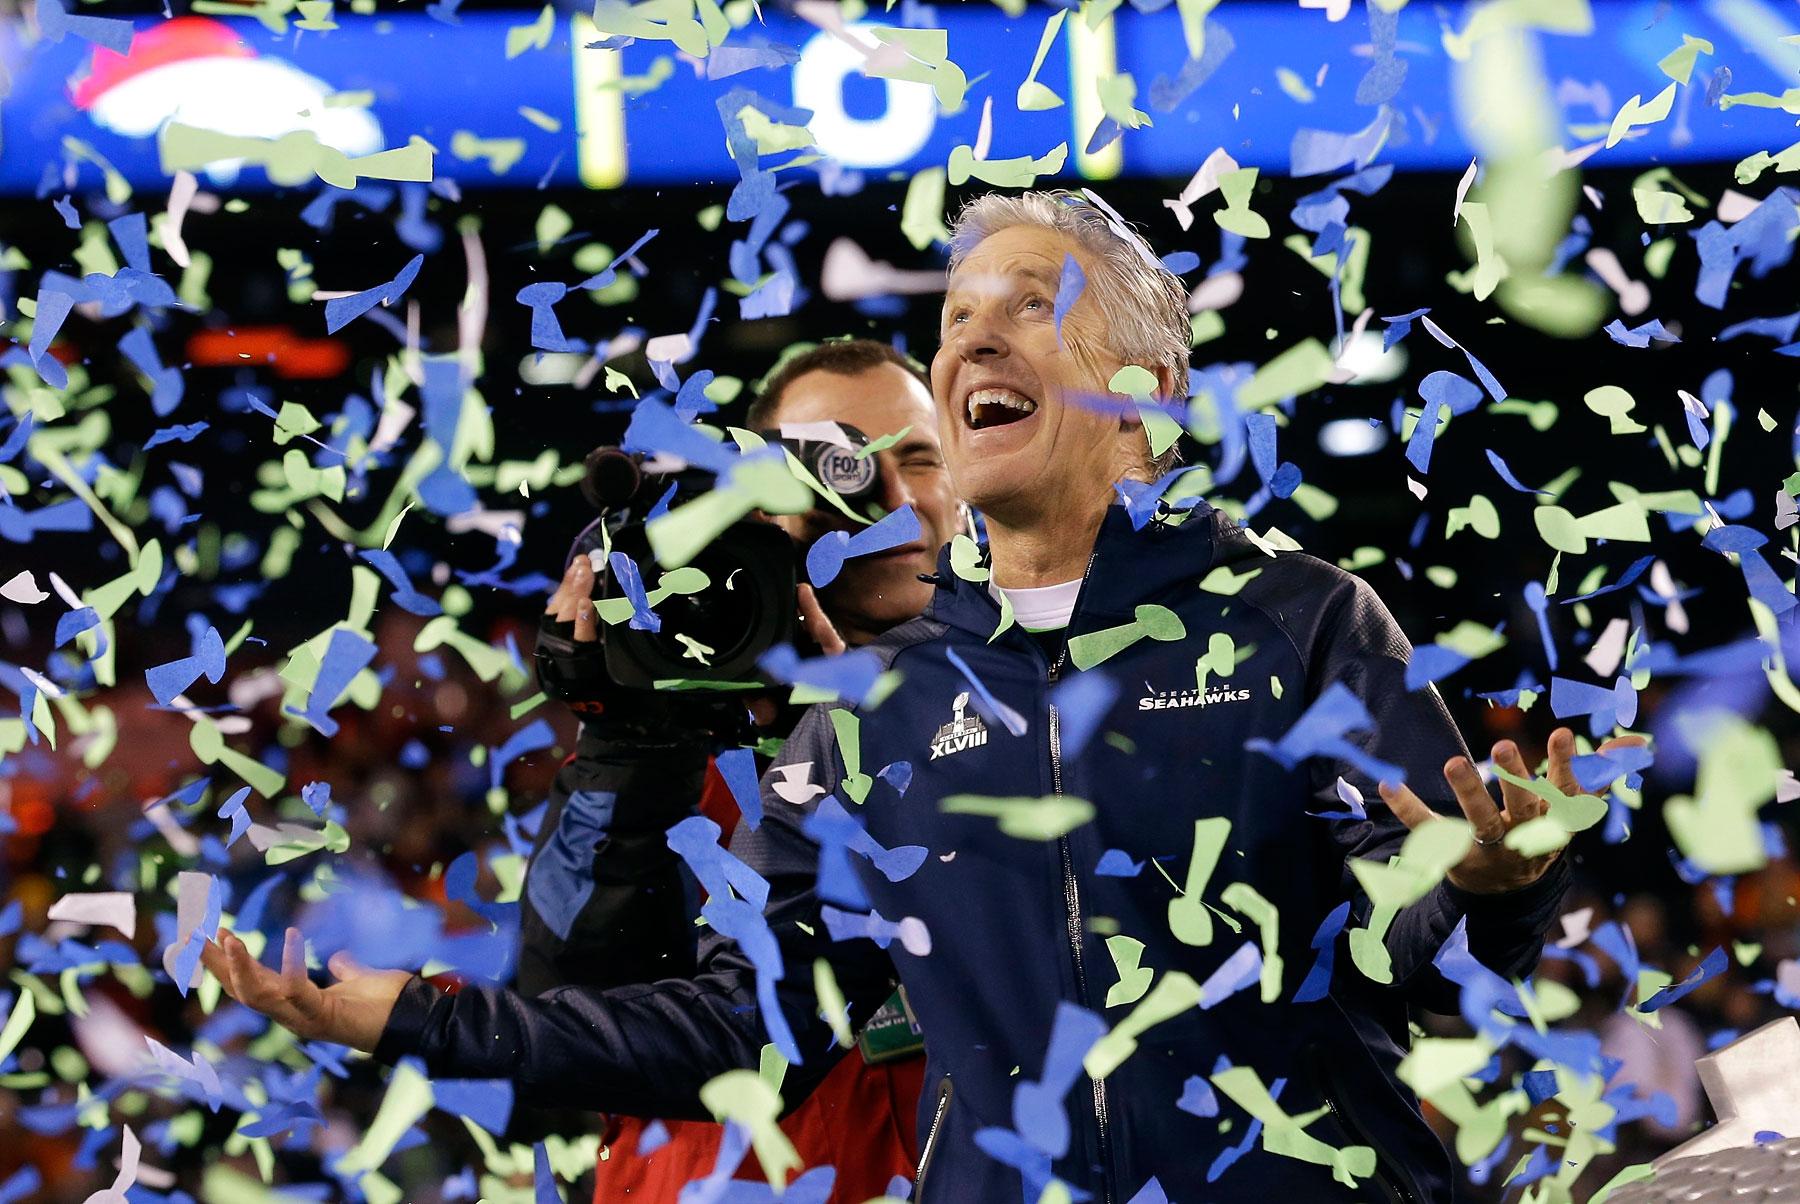 Seattle Seahawks head coach Pete Carroll celebrates after the NFL Super Bowl XLVIII against the Denver Broncos, 43-8.